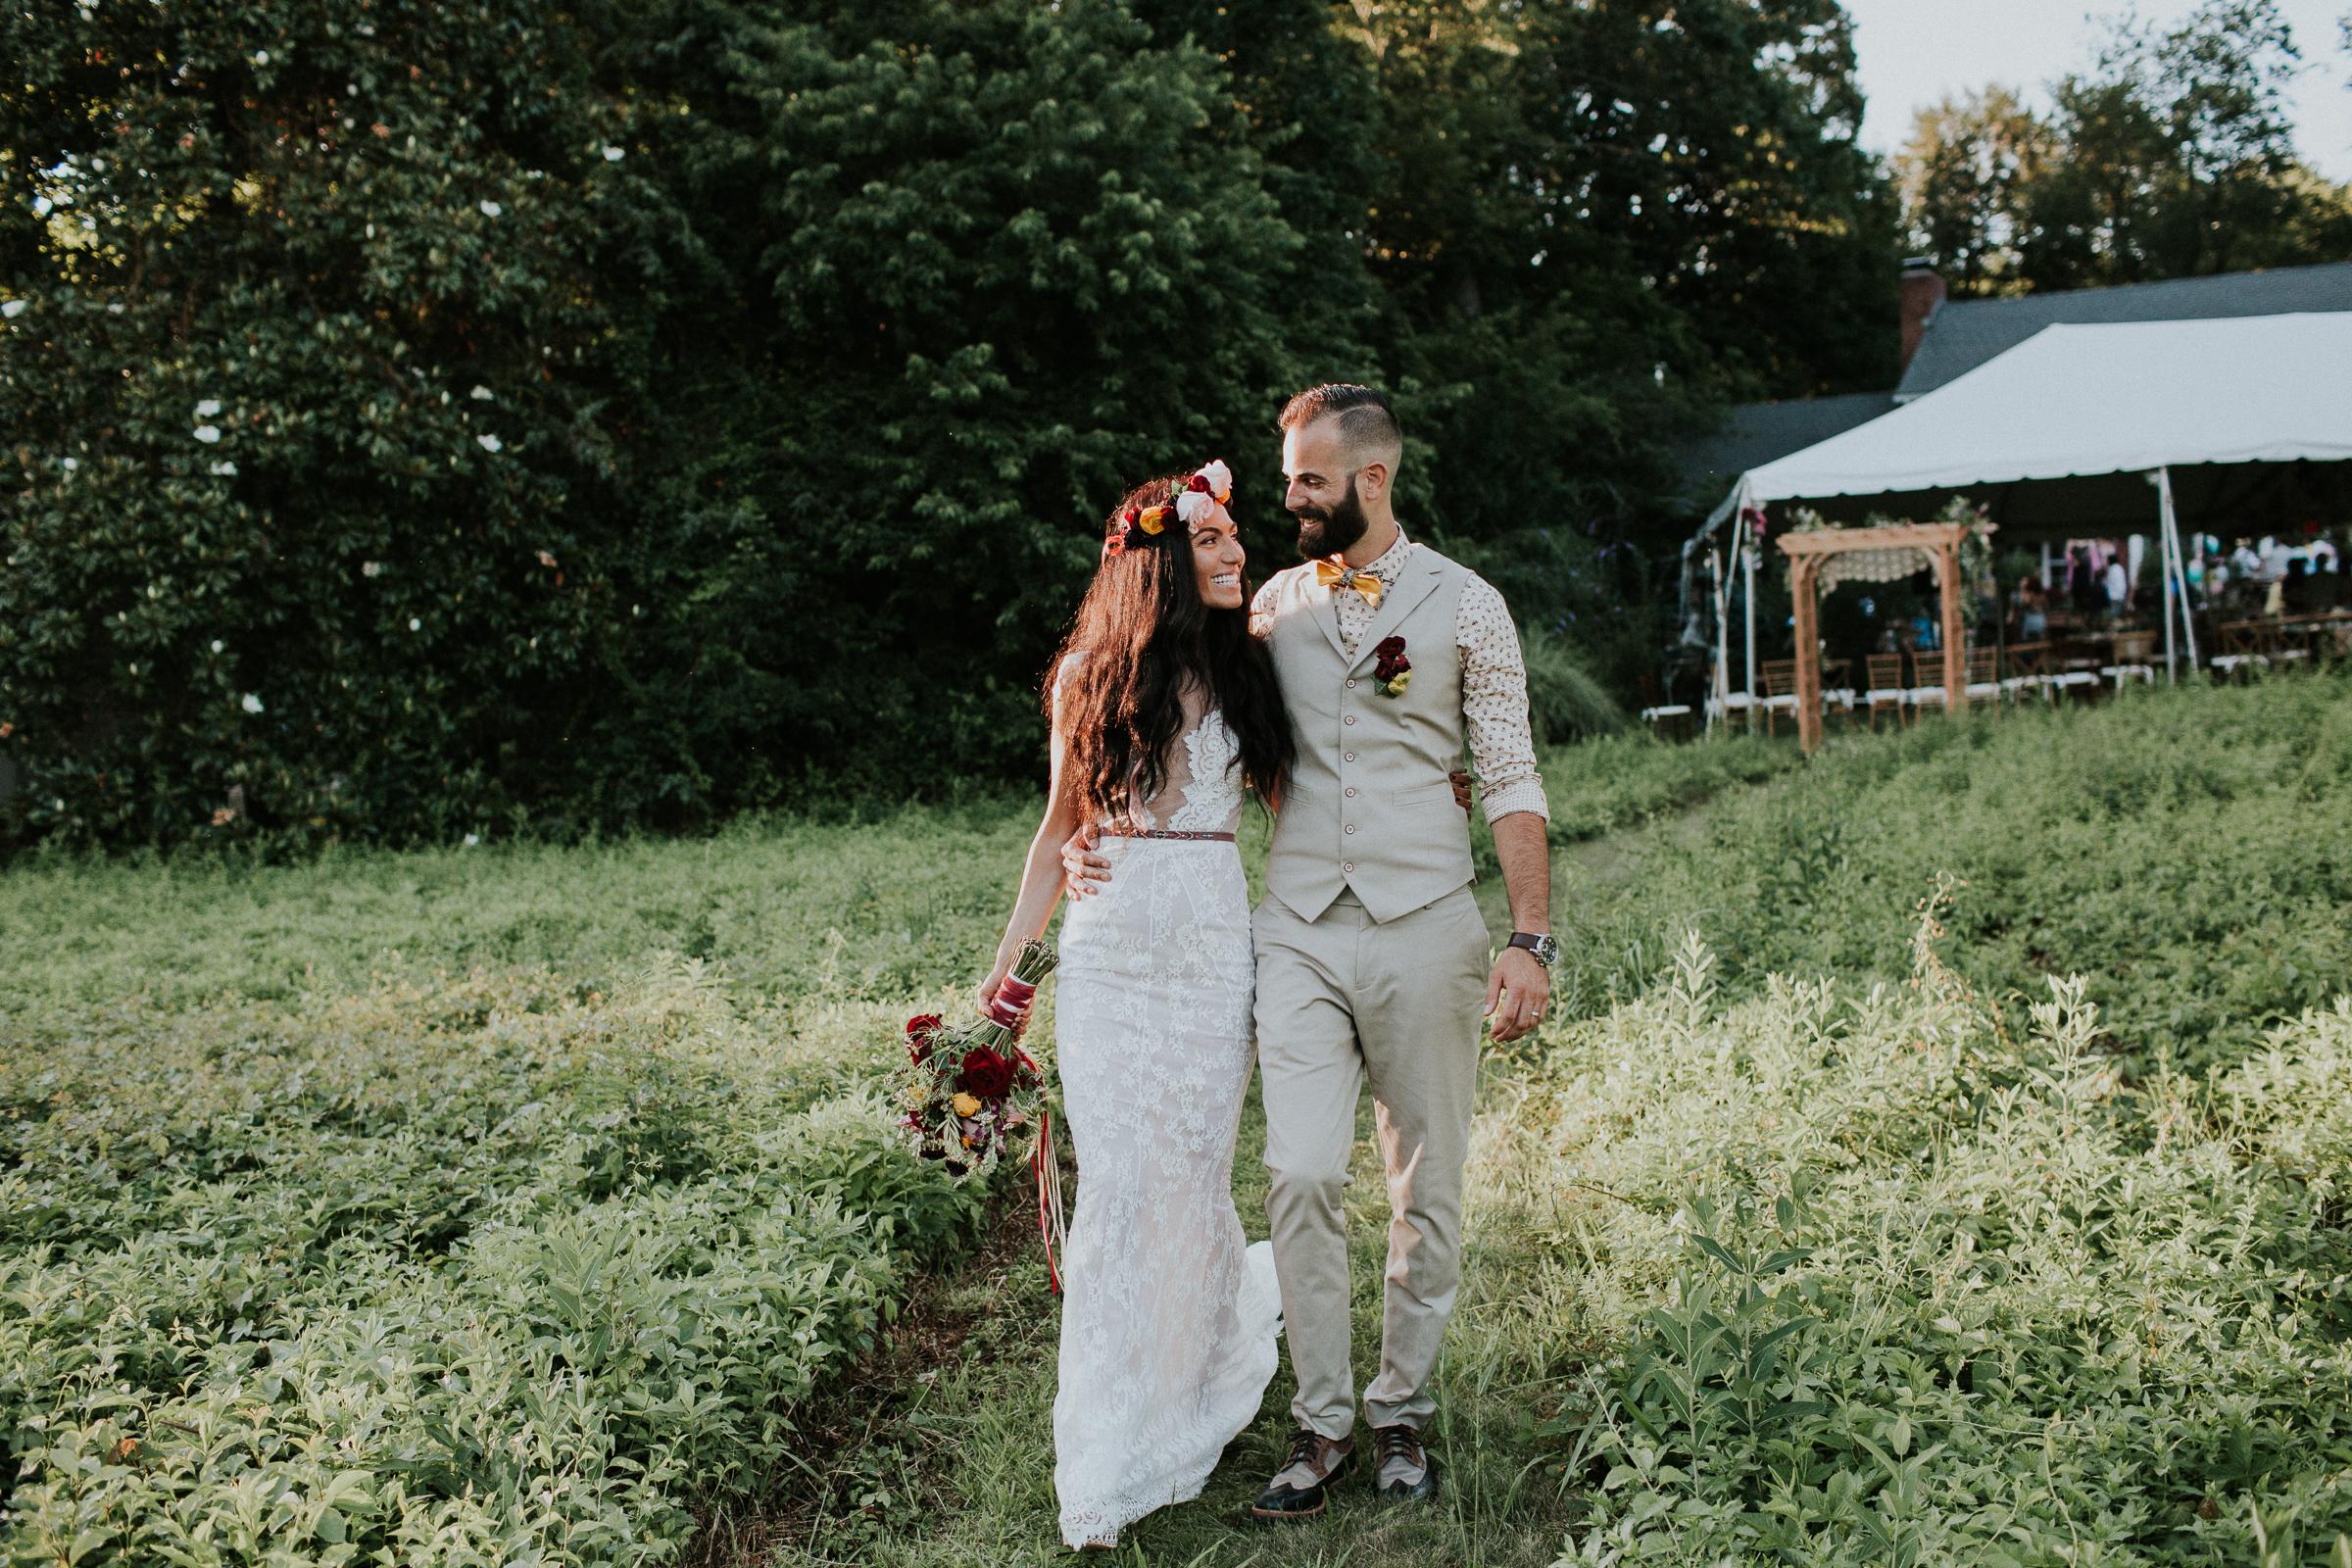 Backyard-Intimate-Adventurous-Destination-Wedding-Darien-Connecticut-Documentary-Wedding-Photography-101.jpg